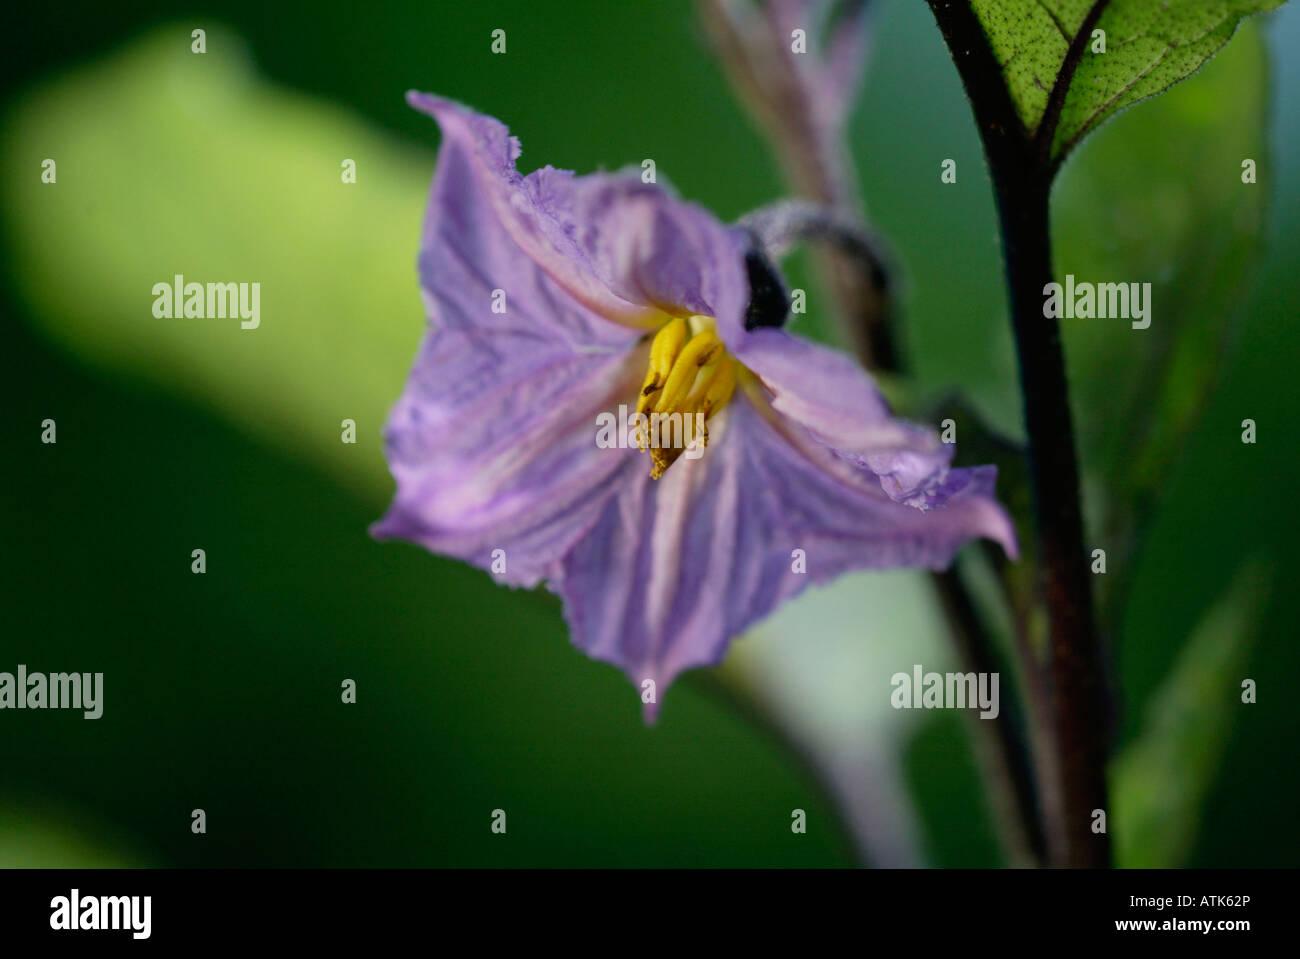 Eggplant / Aubergine / Eierfrucht Stock Photo